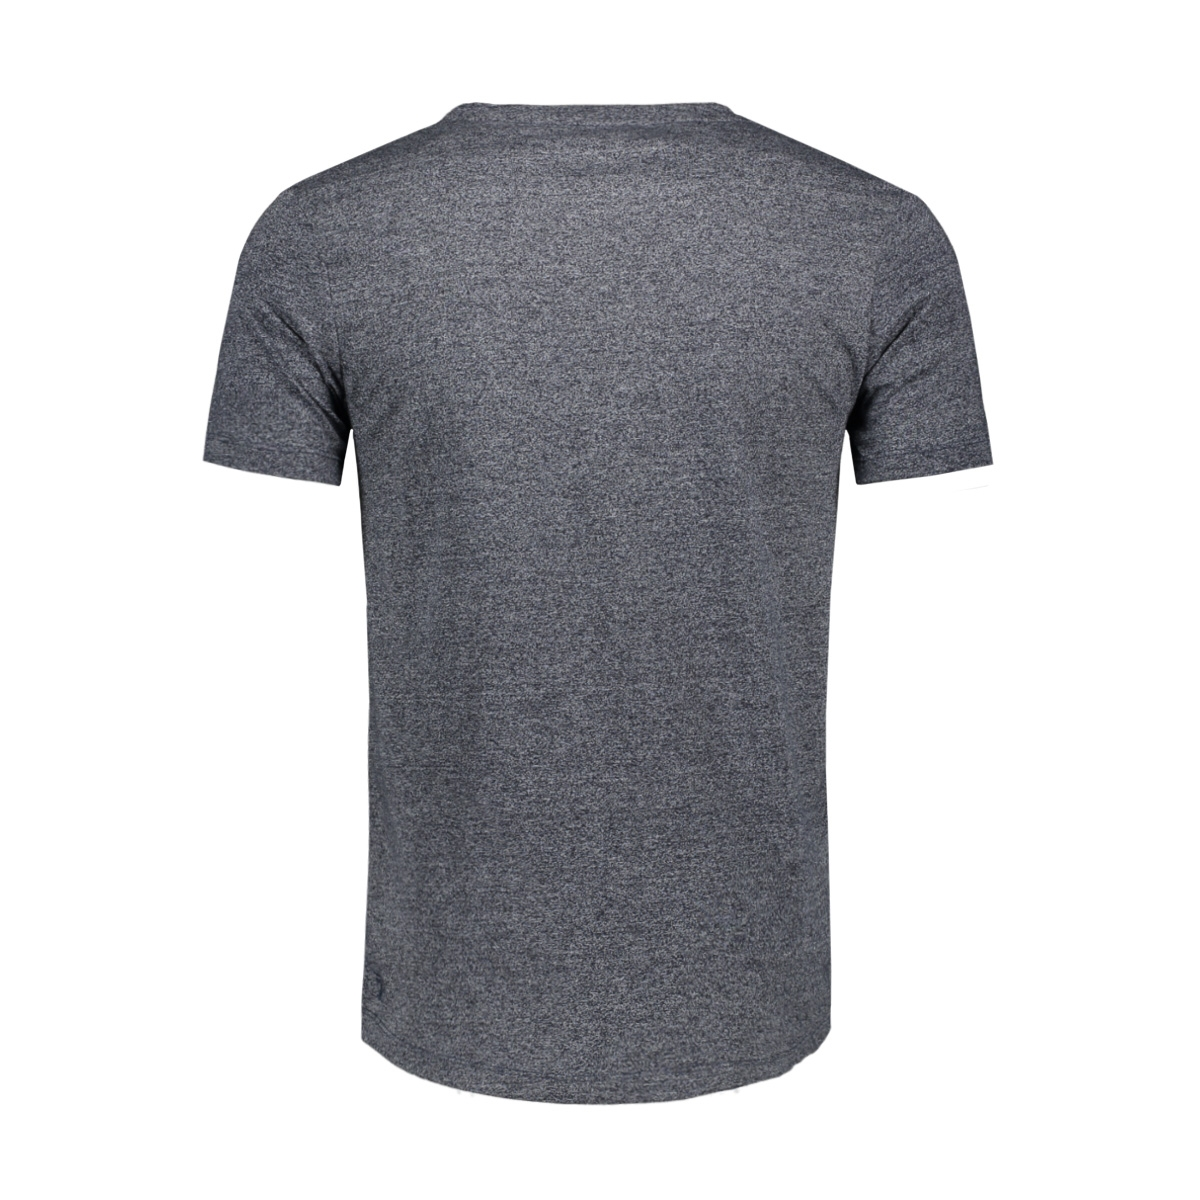 1008852xx12 tom tailor t-shirt 13684